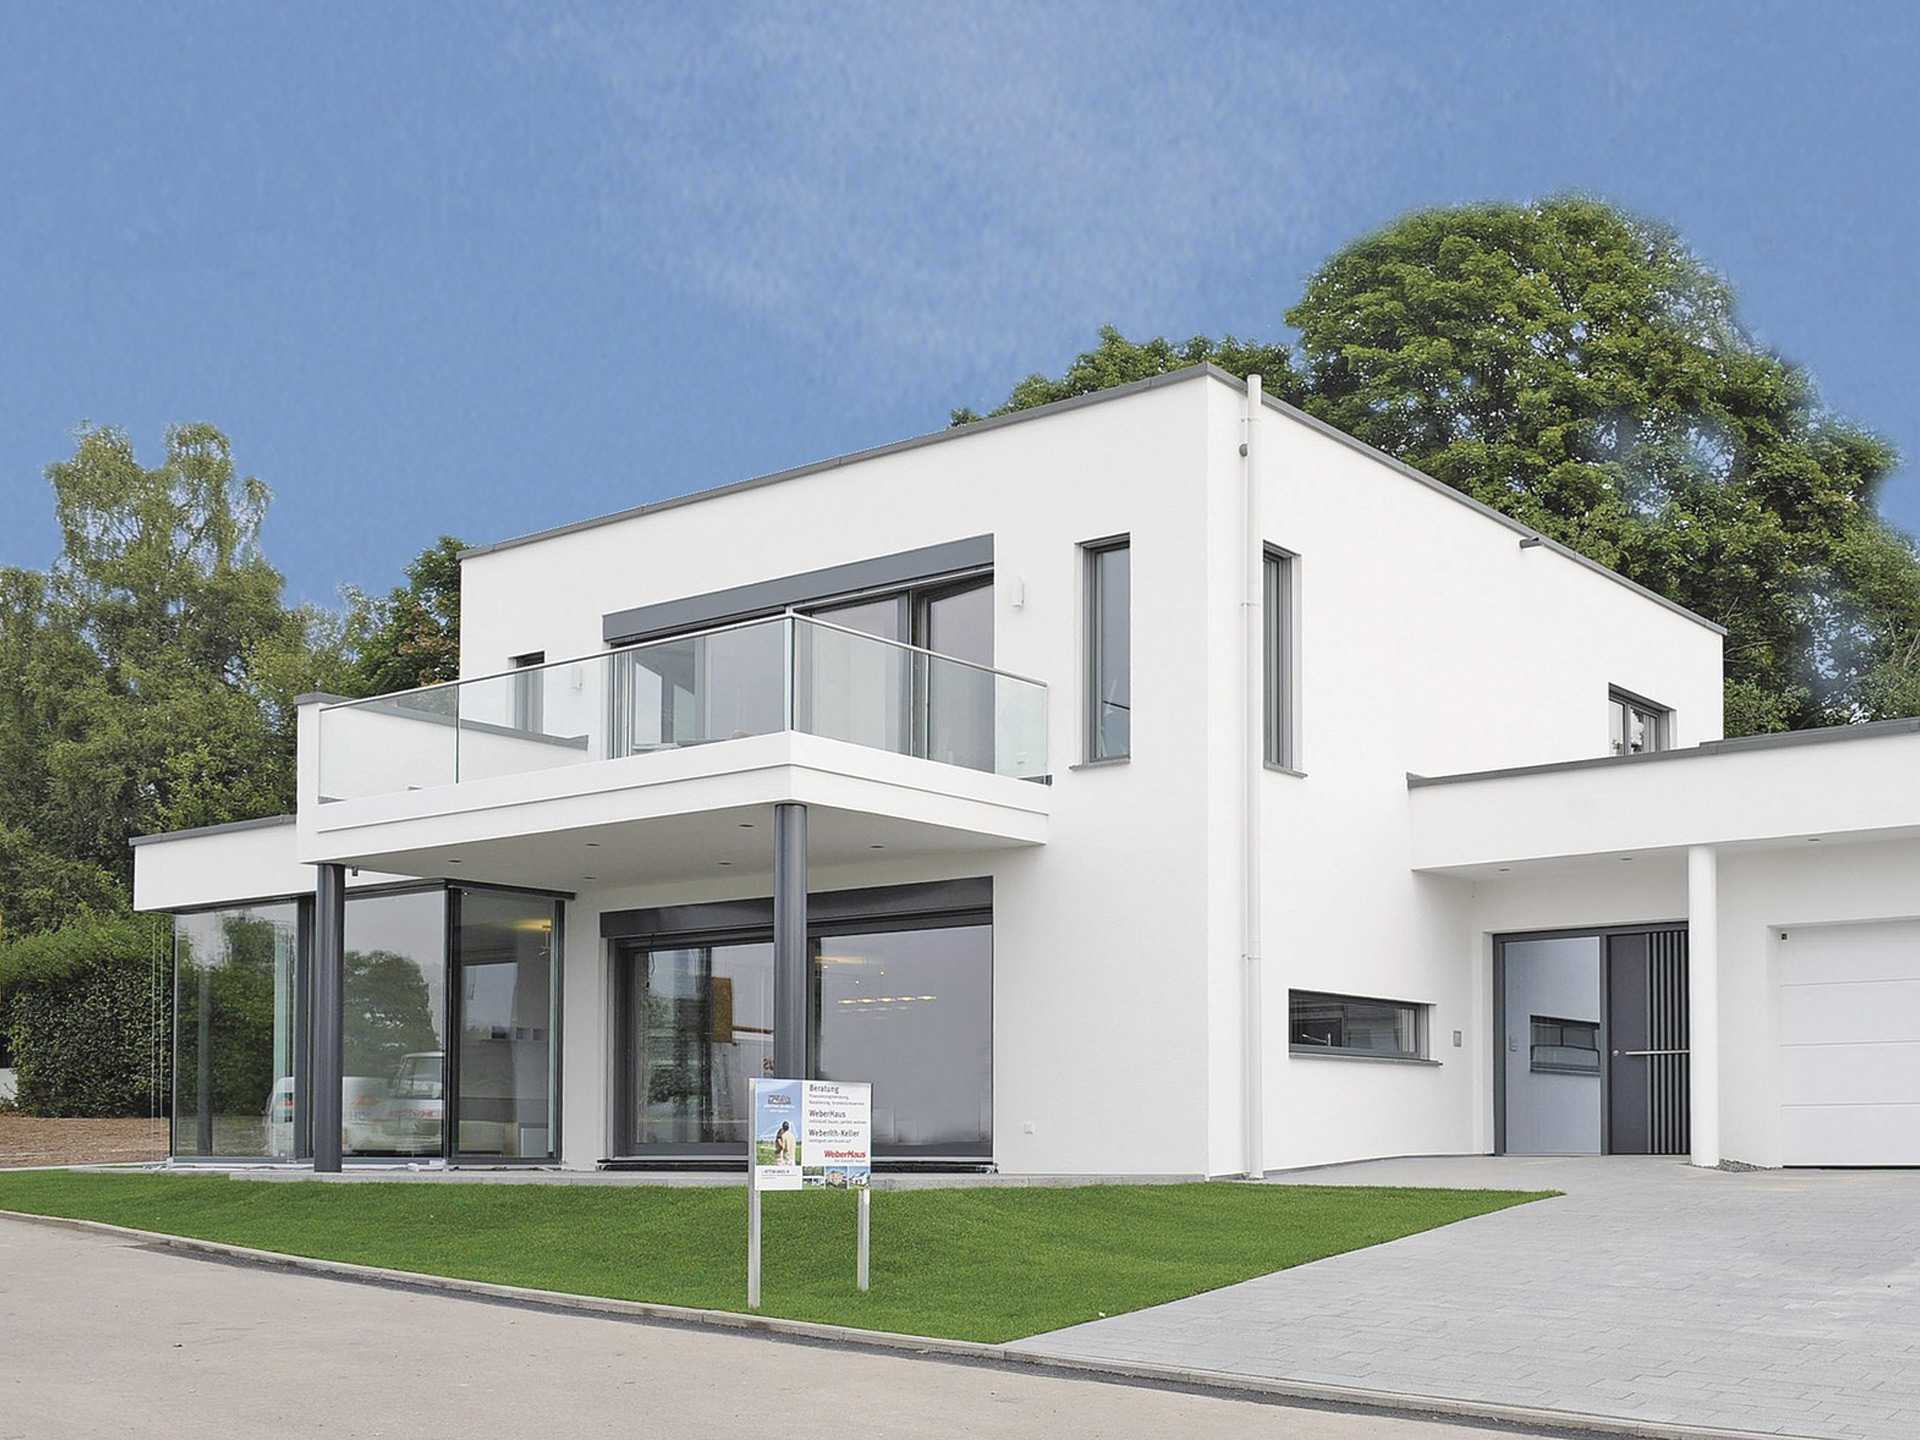 hausbaupark villingen schwenningen musterhauspark. Black Bedroom Furniture Sets. Home Design Ideas